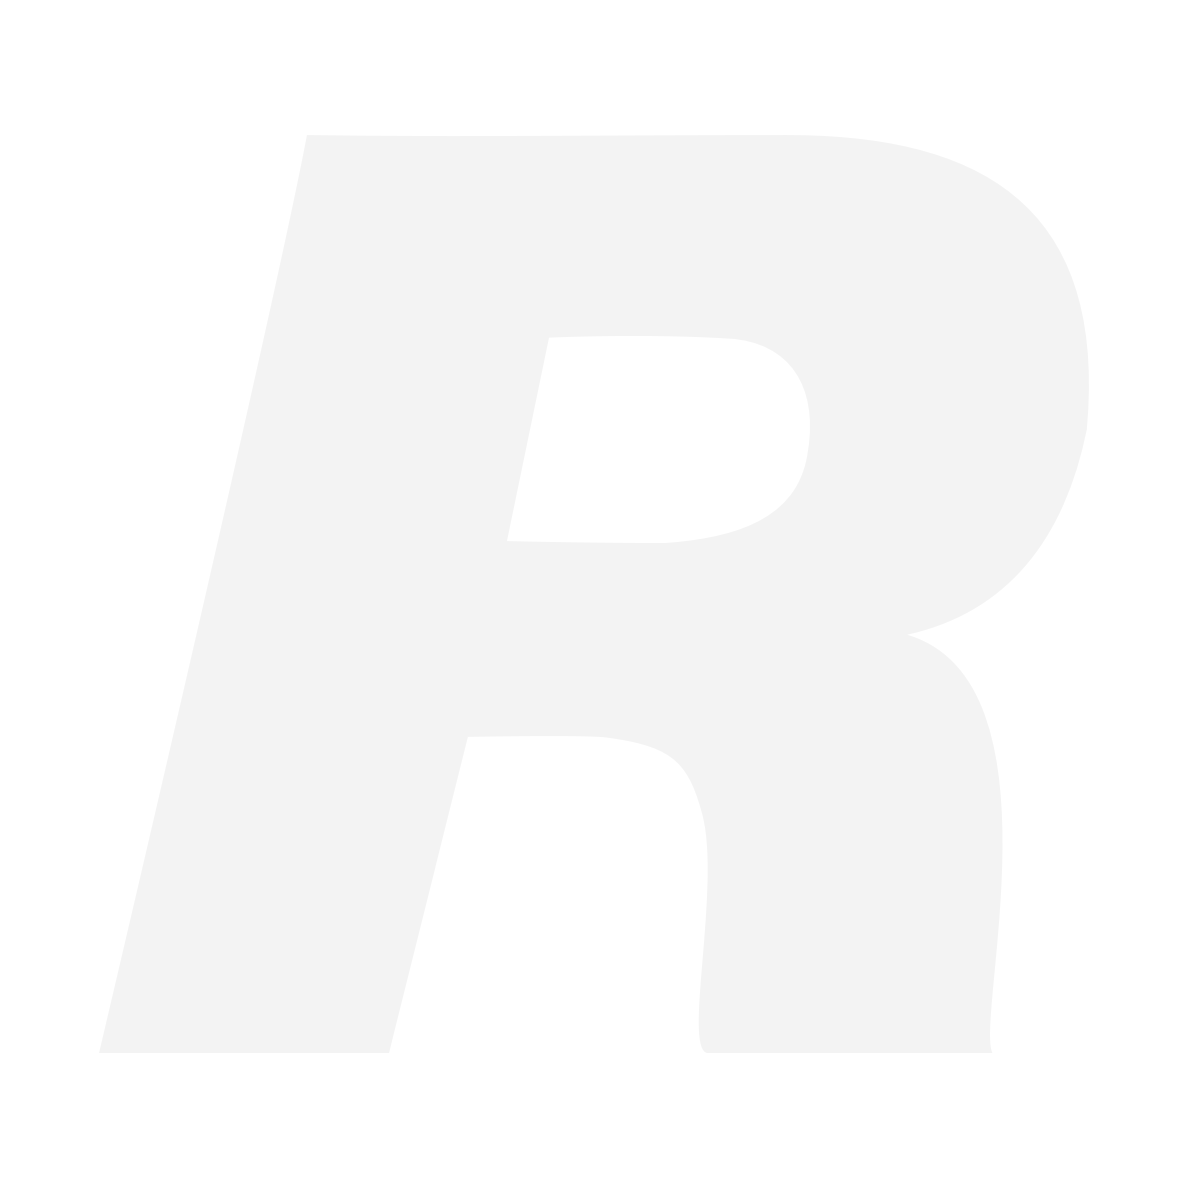 RODE REPORTER MIKROFONI KÄYTETTY